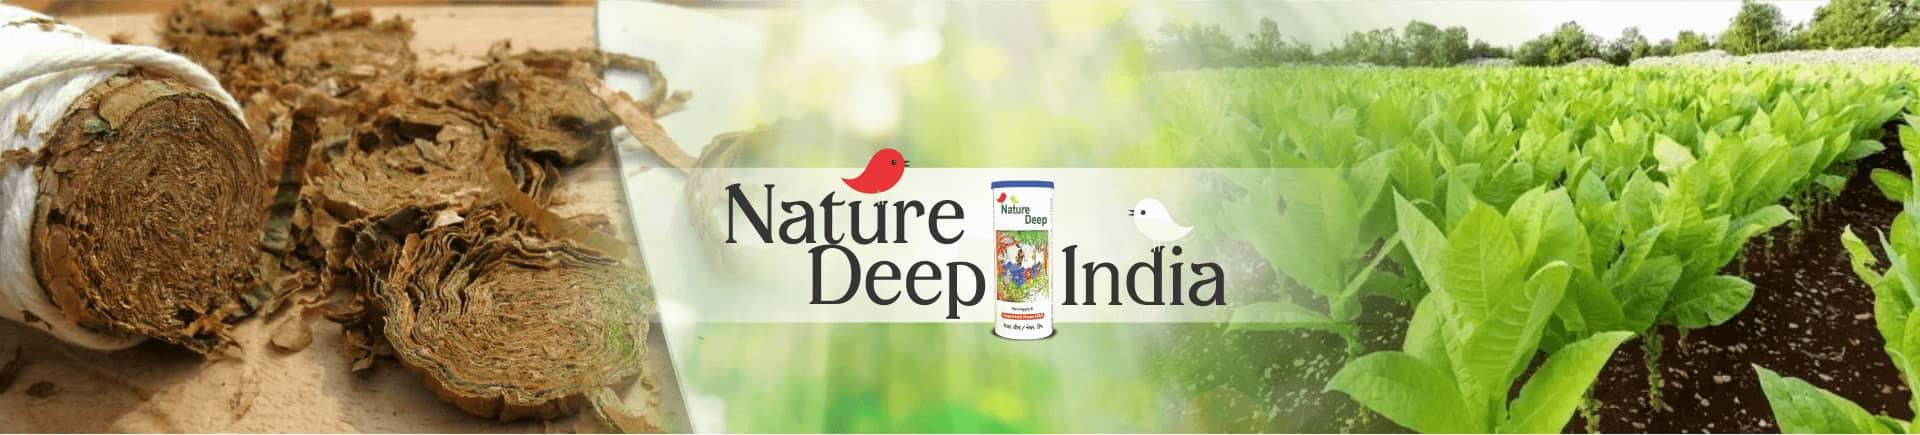 sumitomo naturedeep for tobacco crop desktop banner